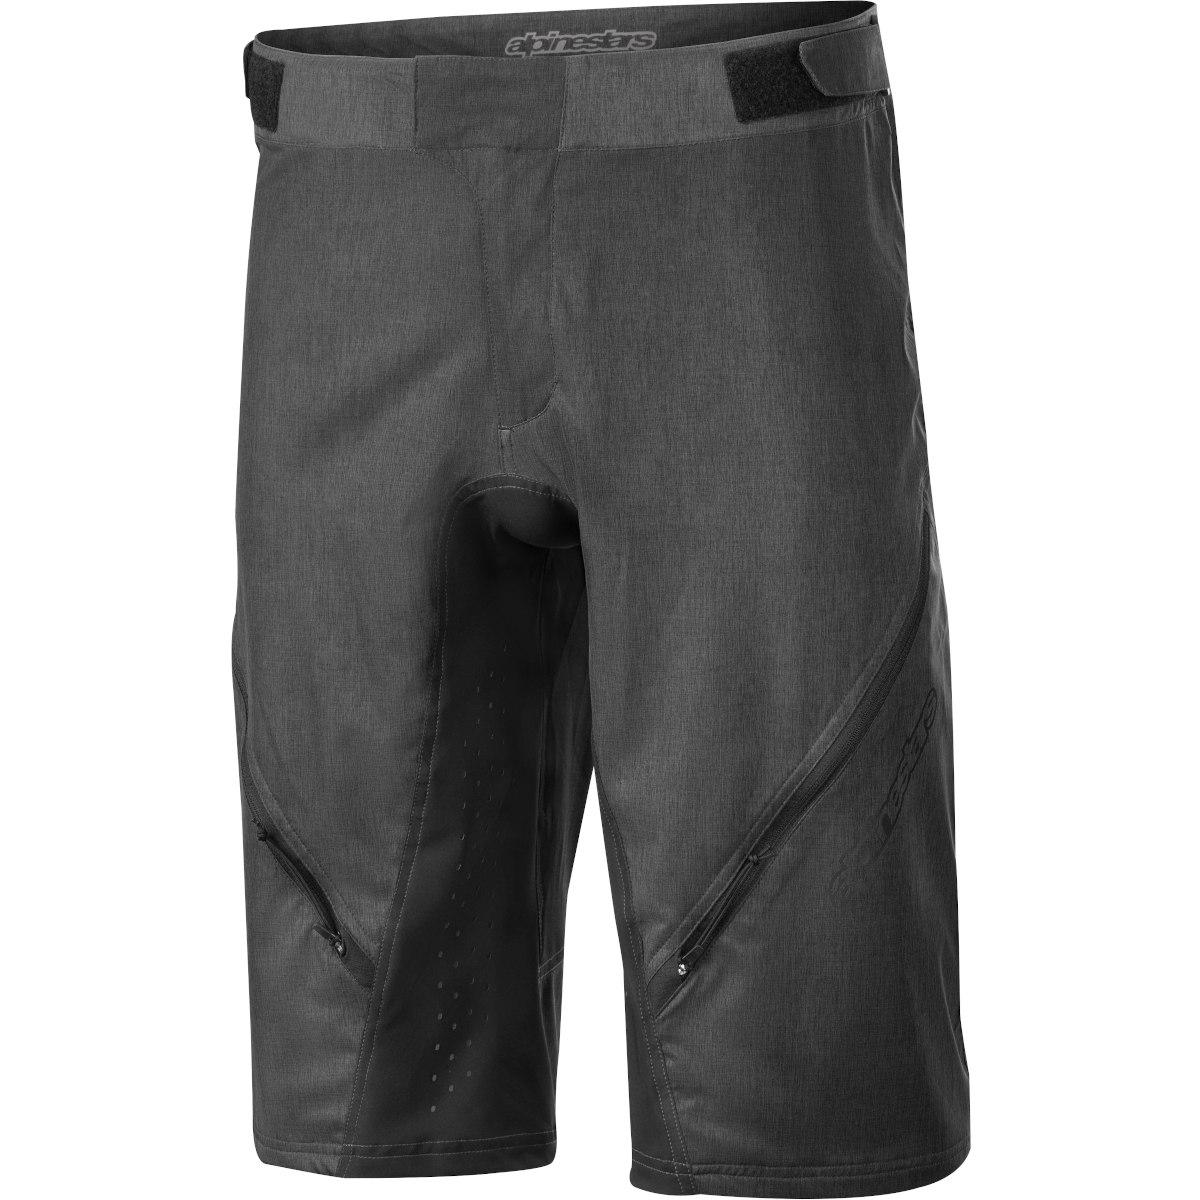 Alpinestars Bunny Hop Shorts - black